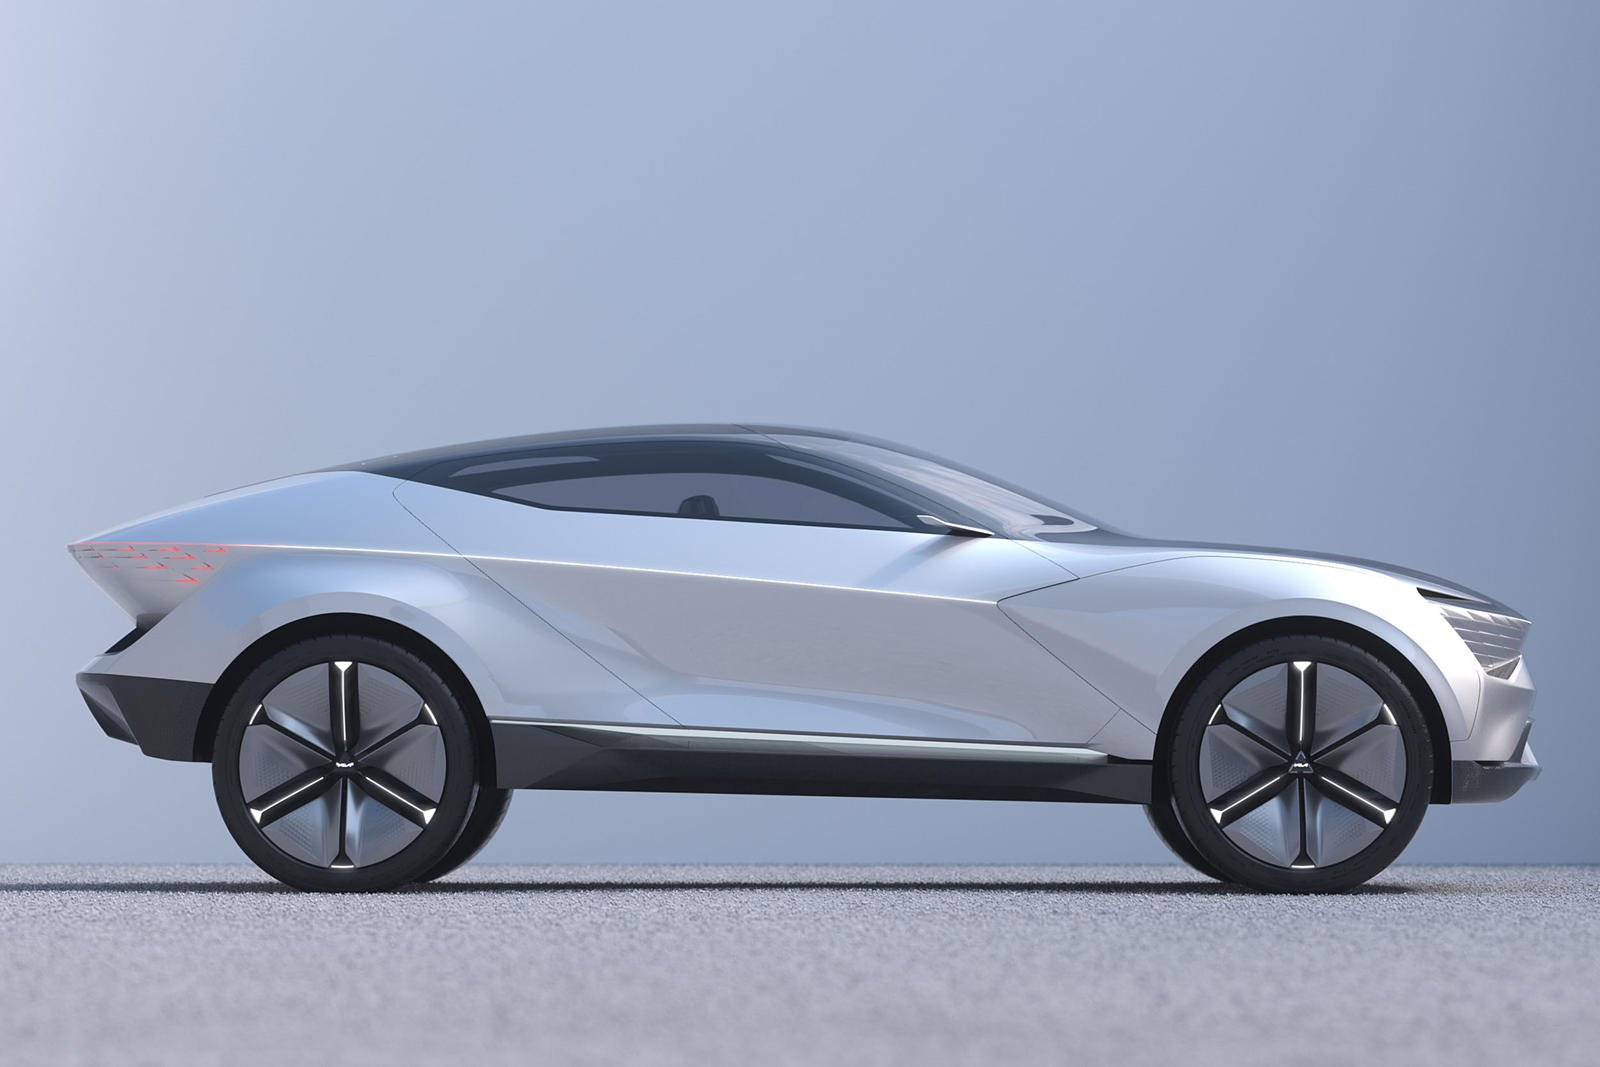 Mẫu xe concept Kia Futuron - ảnh 2.